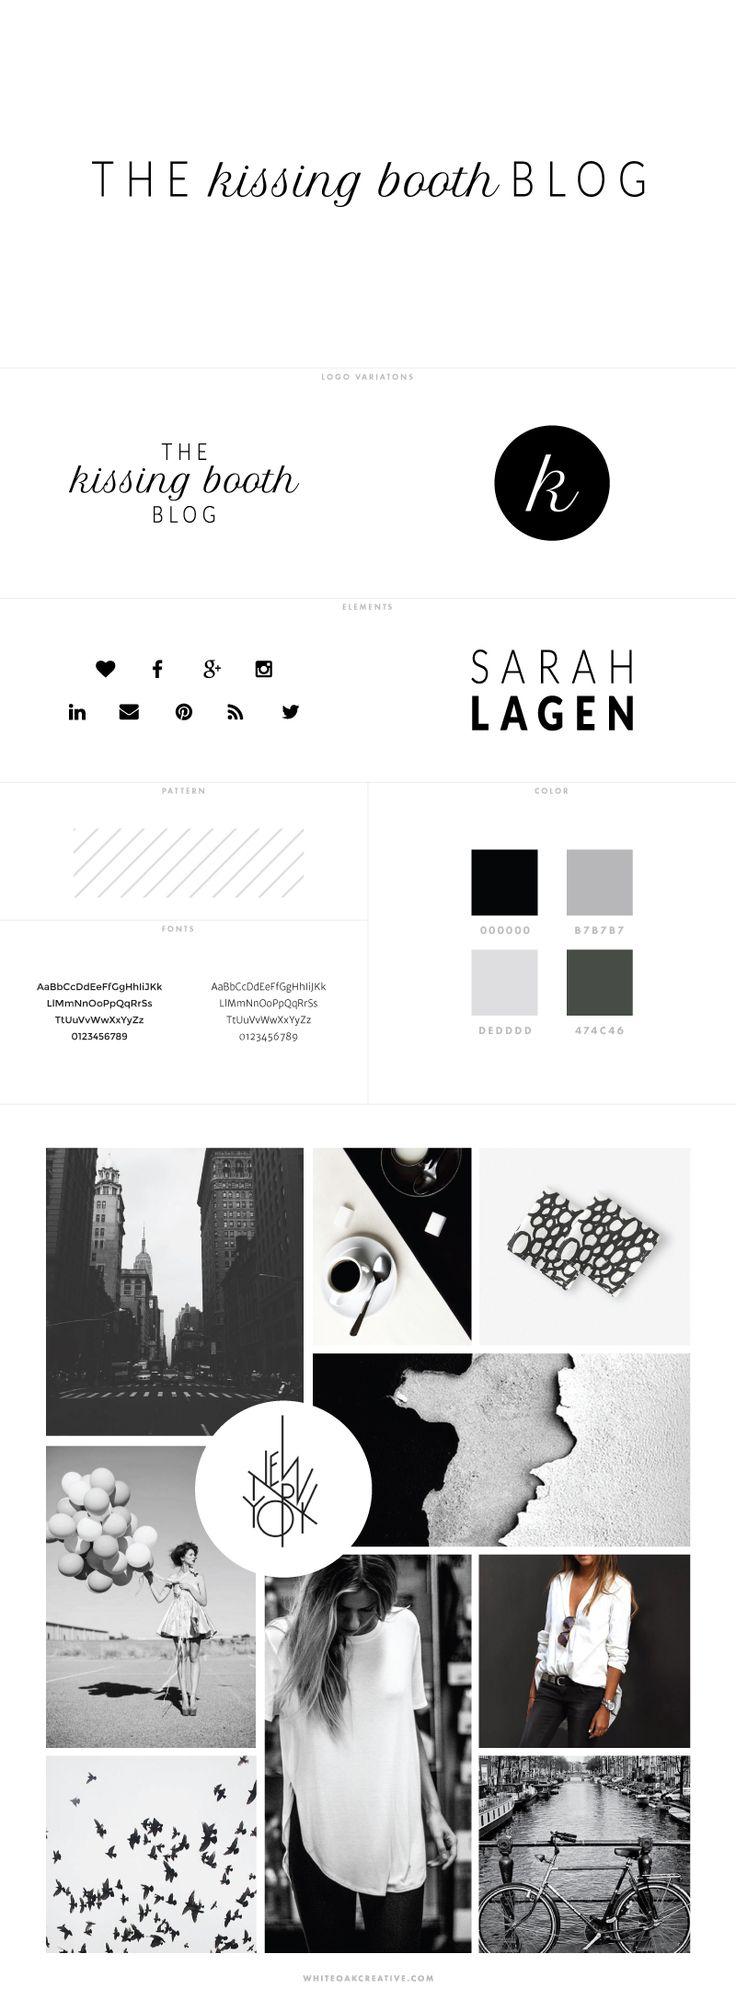 The Kissing Booth Blog Design for WordPress by White Oak Creative - logo design, wordpress theme, mood board inspiration, blog design idea, graphic design, branding